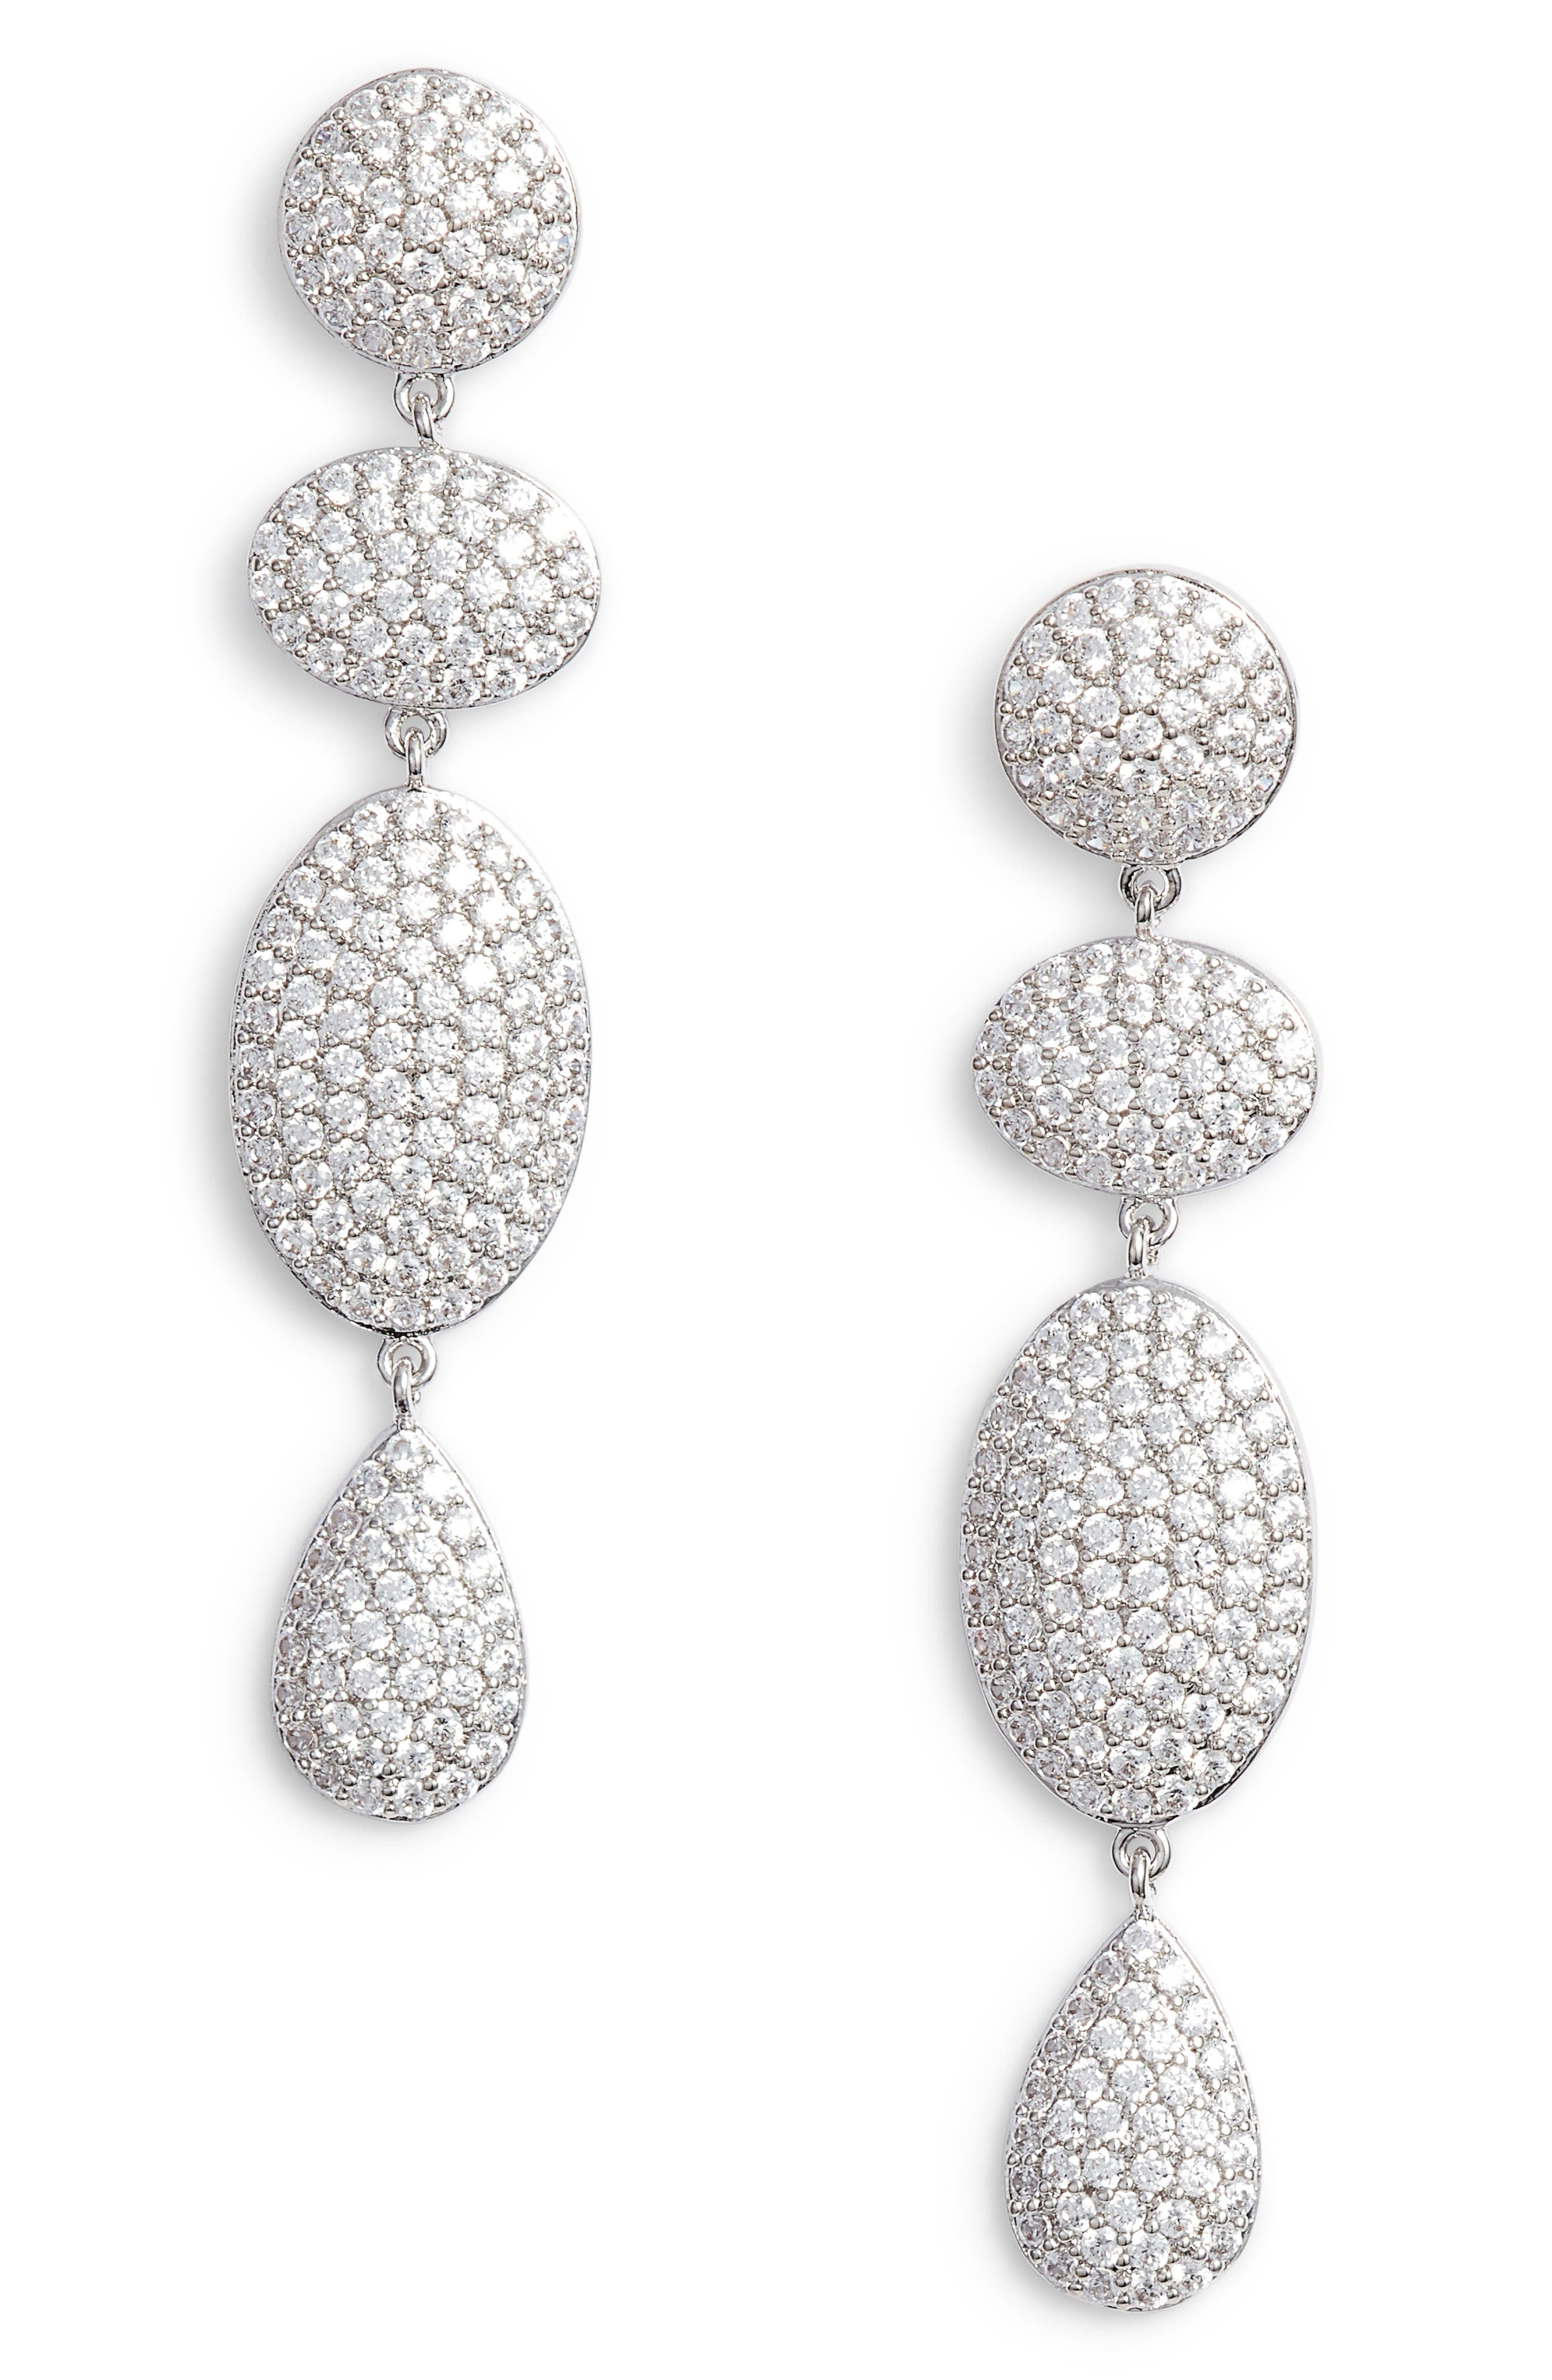 Pavé Spheres Multishape Drop Earrings,                         Main,                         color, CLEAR/ SILVER